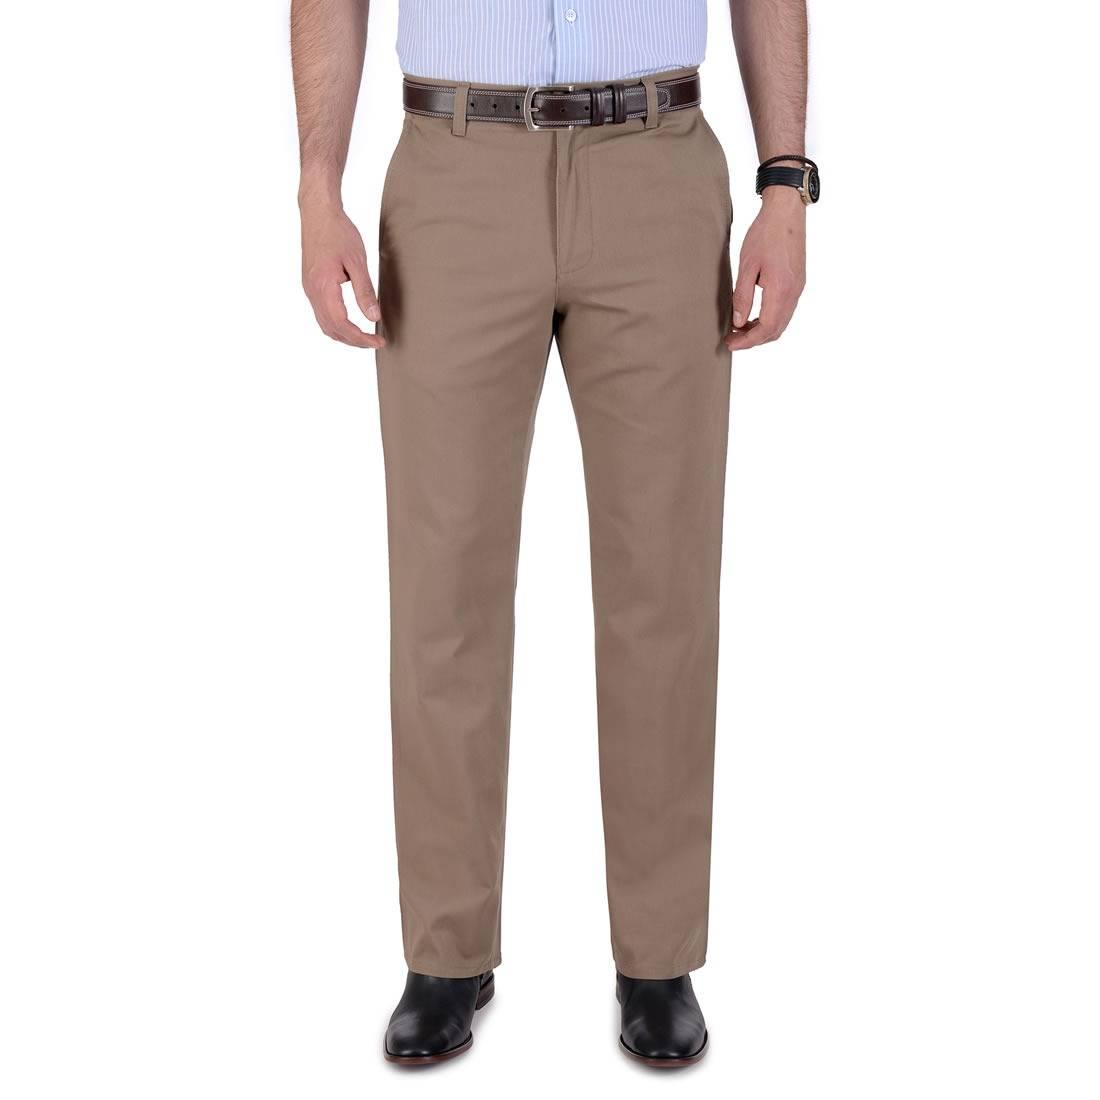 010789055268-01-Pantalon-Casual-Classic-Fit-Cafe-yale